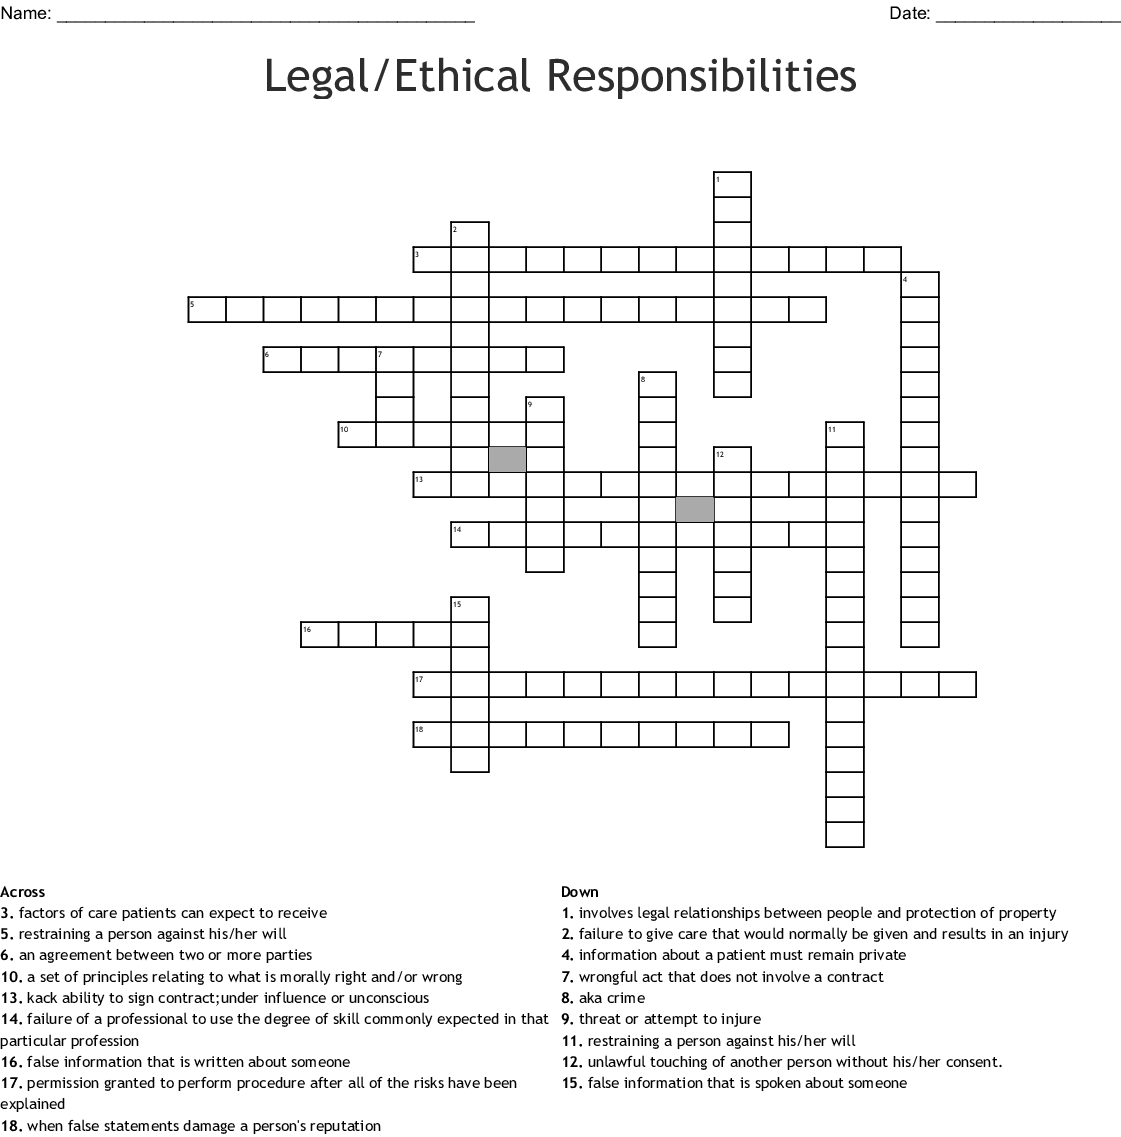 Ethics Legal Terms Crossword Wordmint